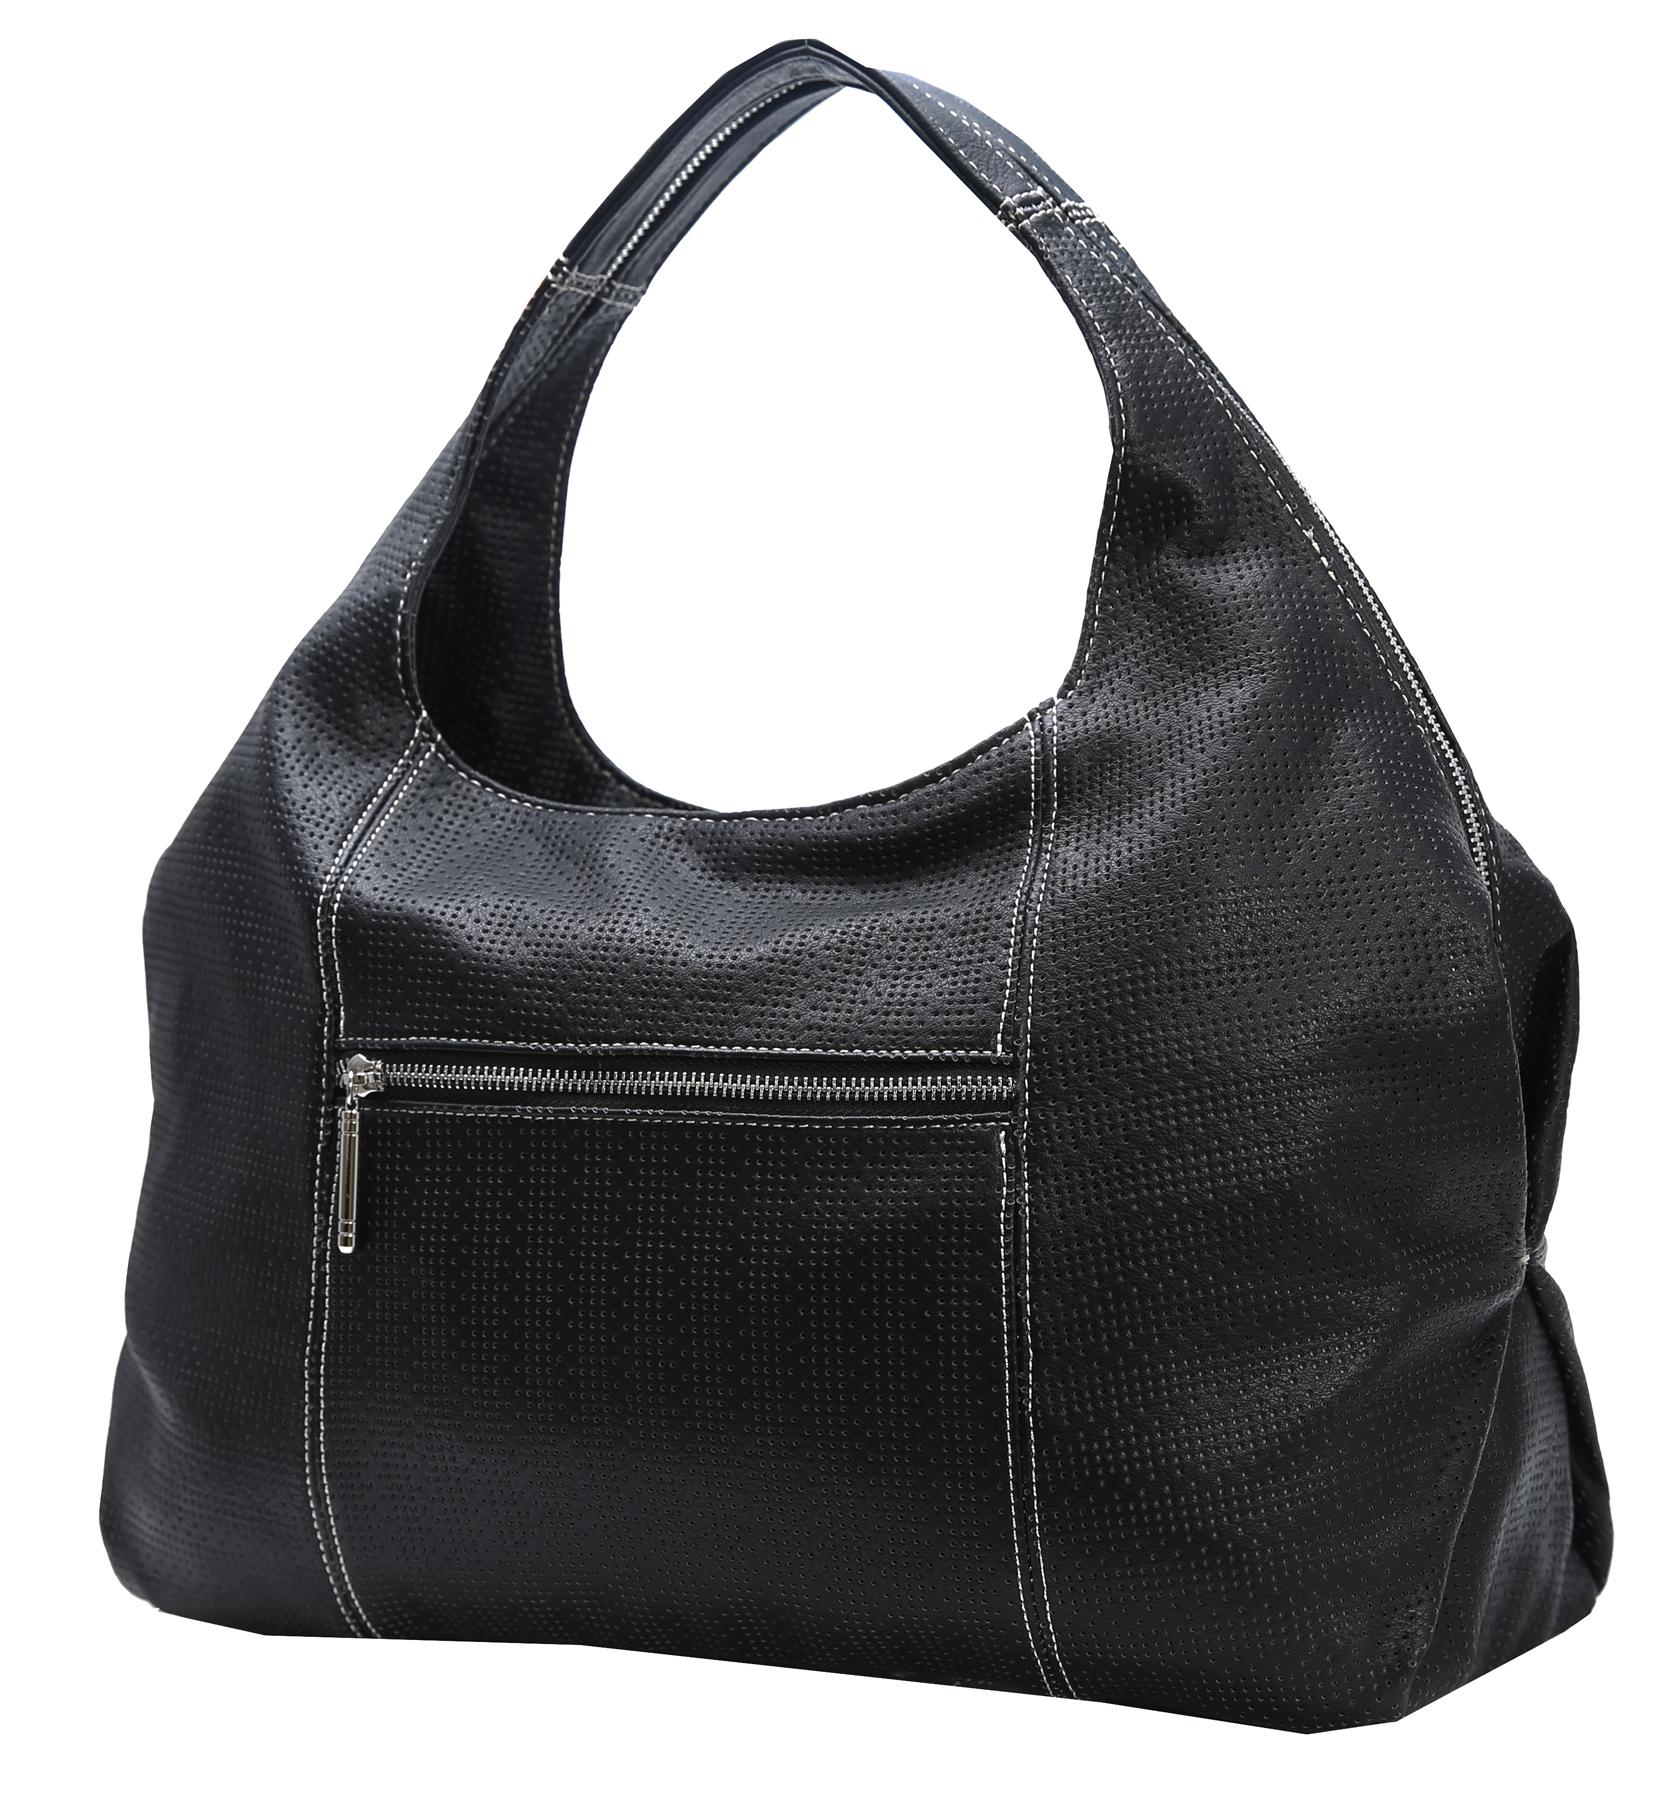 ... Heshe PU Womens Leather Handbags Top Handle Bag Totes Bags H ... b314d1c694d60